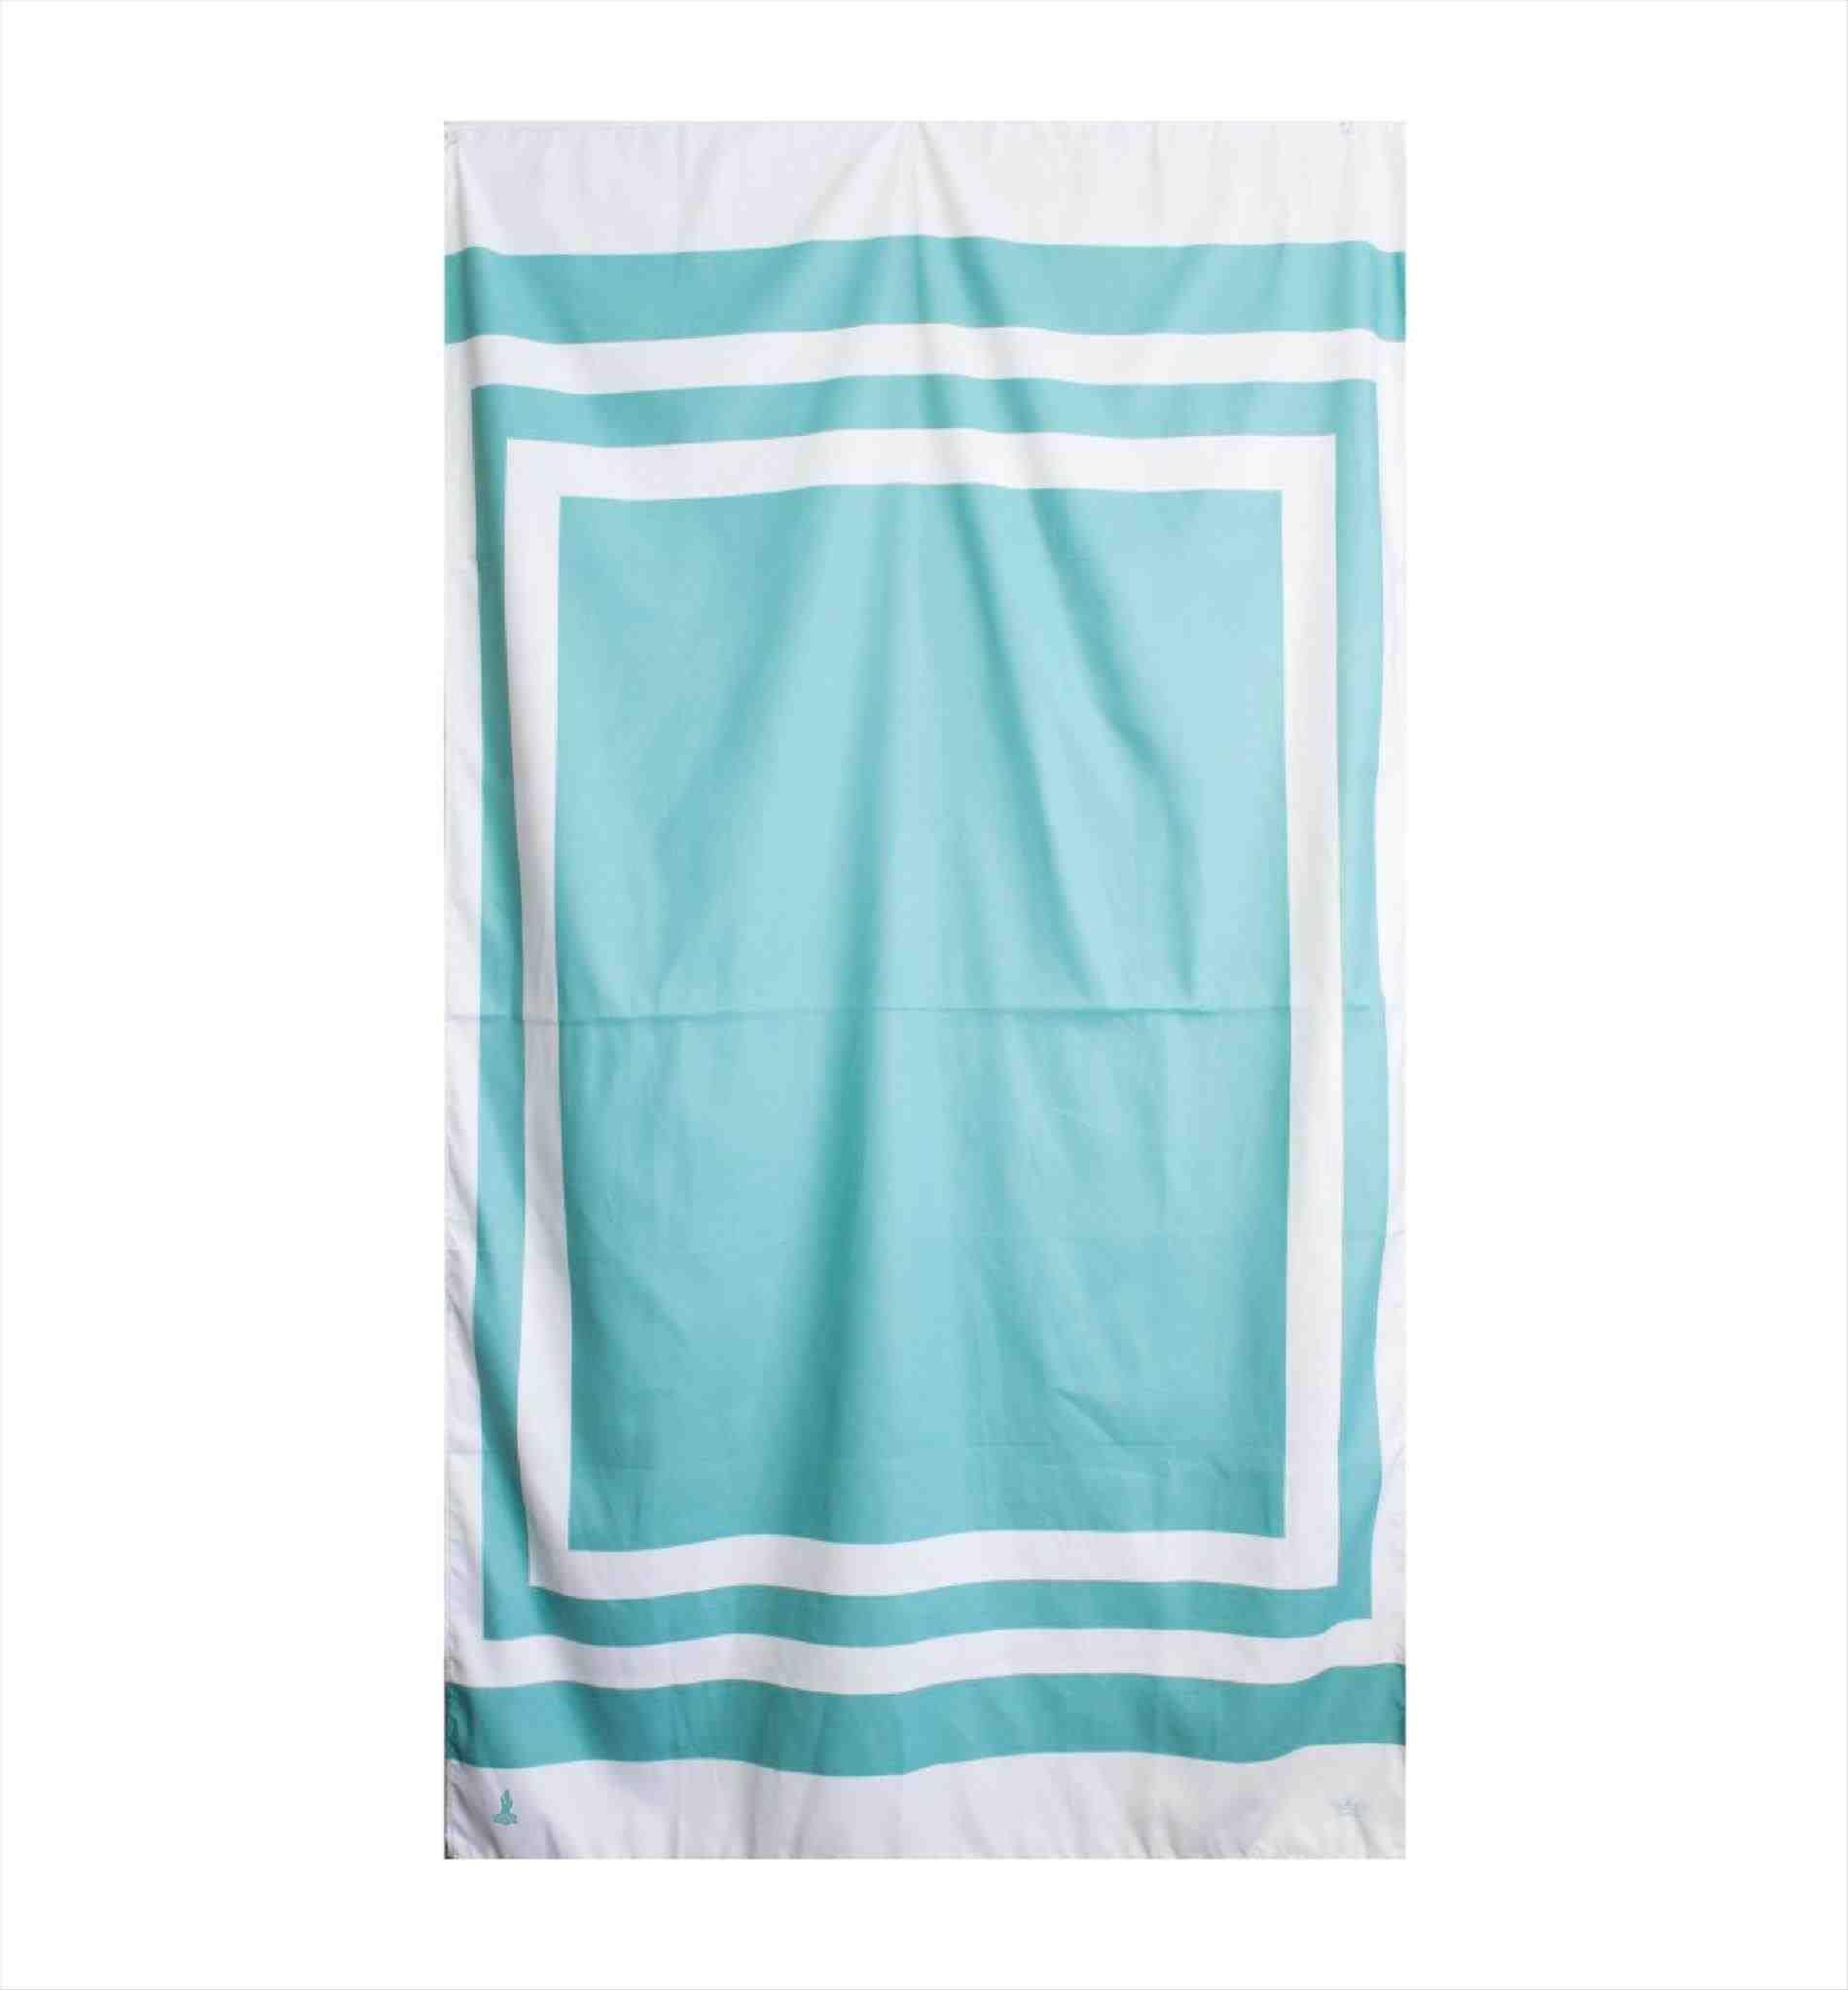 This Beach Towel Png Language Jovana Rug Geneva Down Alternative Duvet Inser This Beach Towel Pn Beach Towel Monogrammed Beach Towels Alternative Duvet